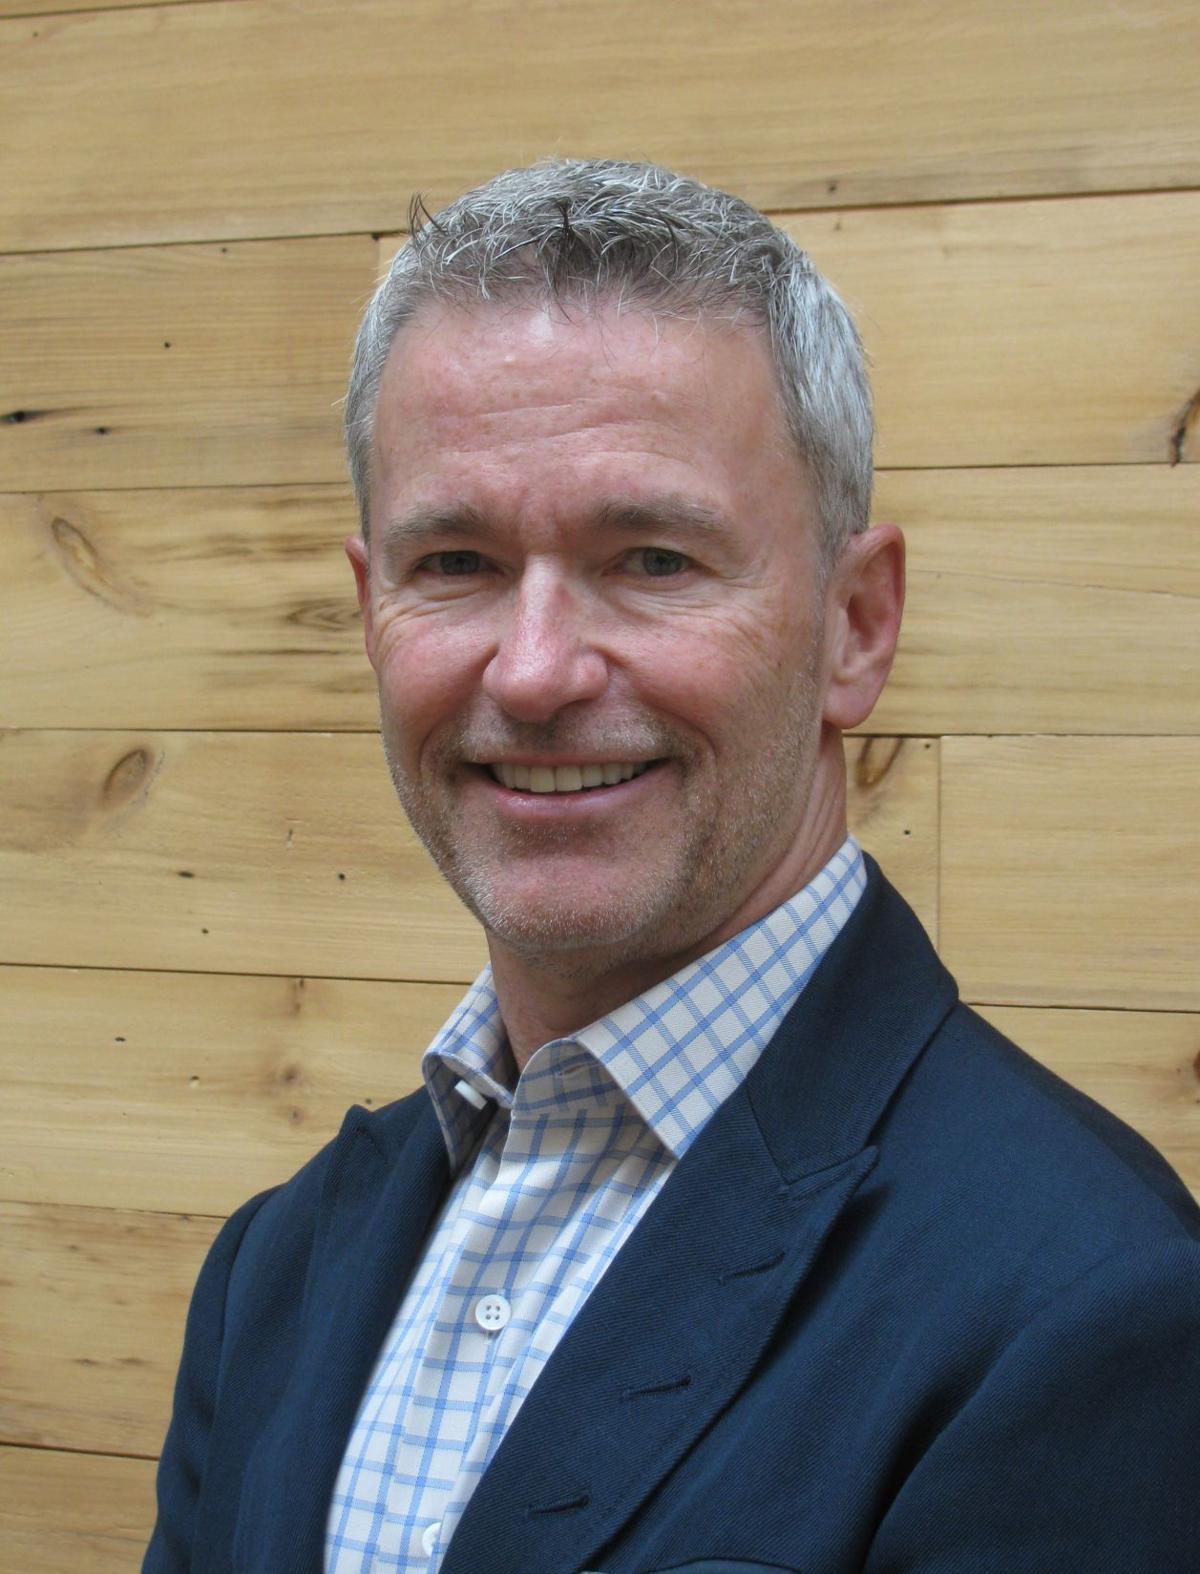 Lands' End CEO Jerome Griffith